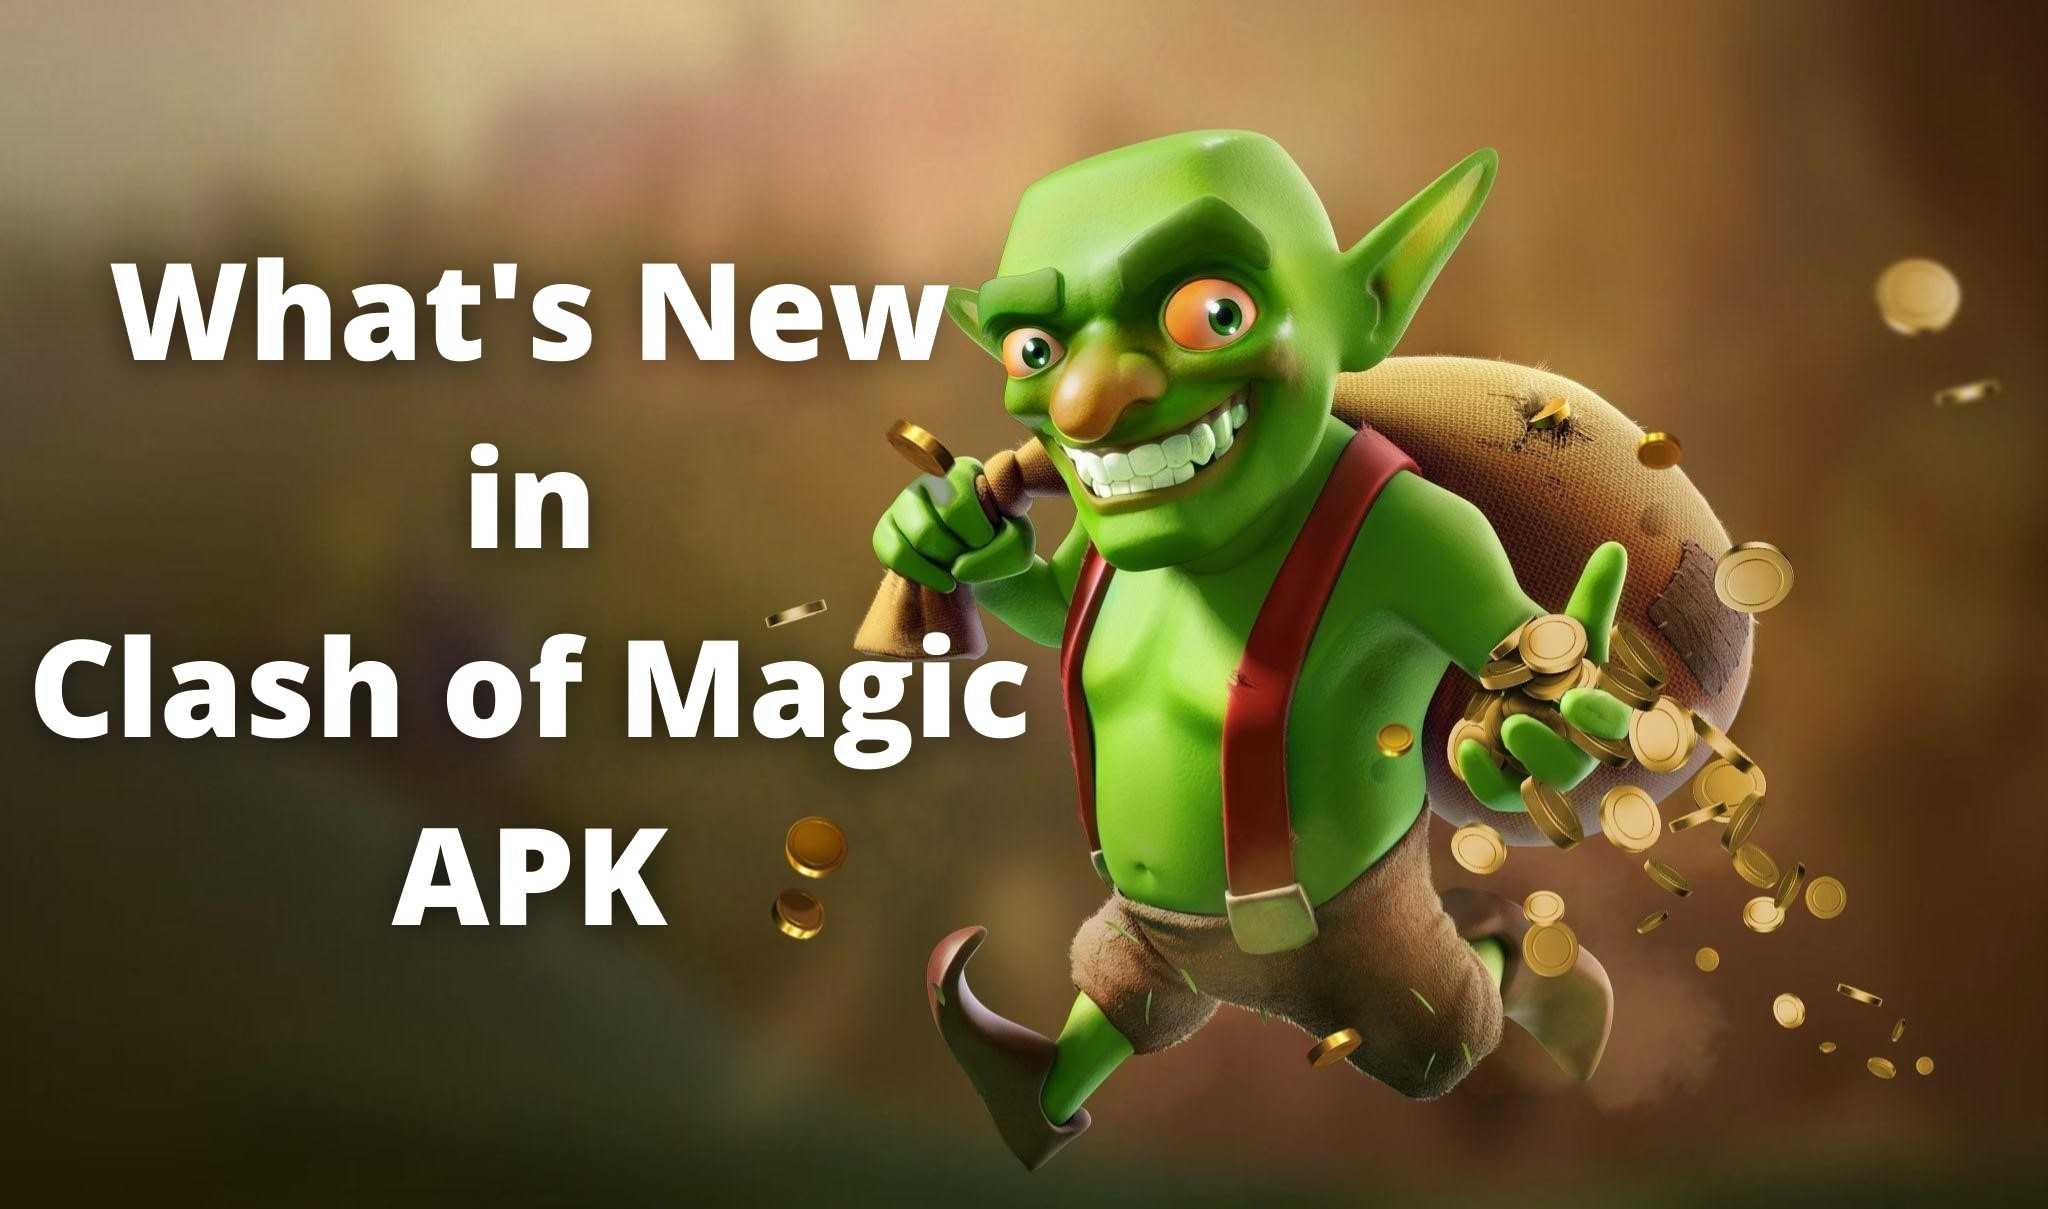 What's New in Clash of Magic APK